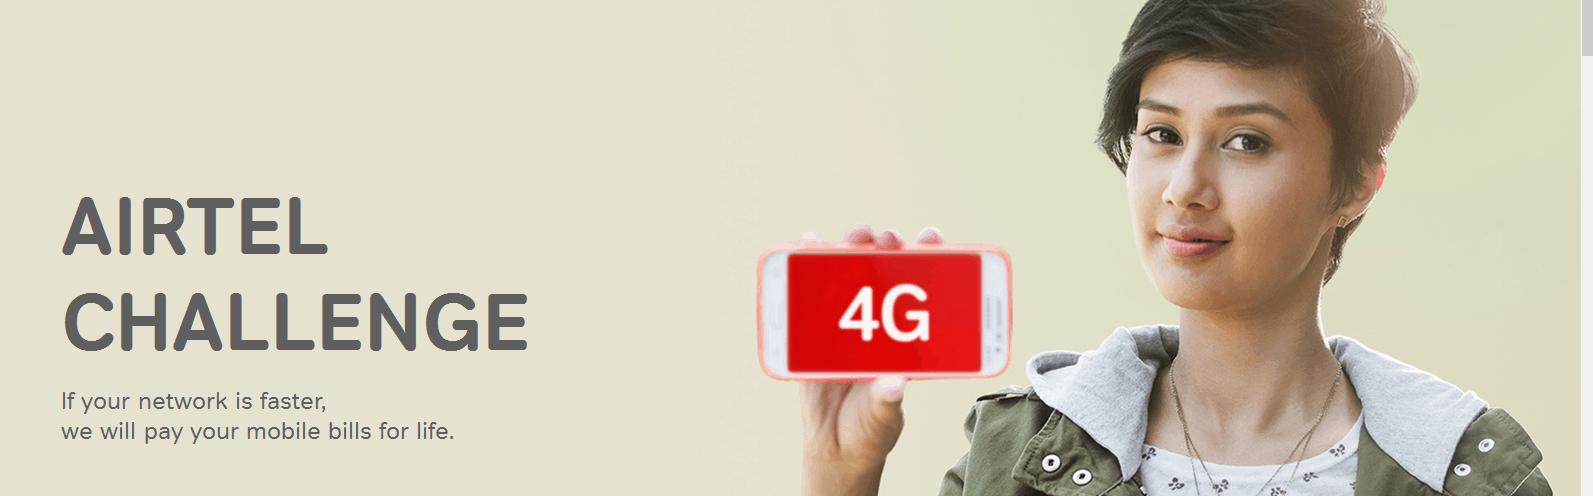 New Airtel 4G Promo Is Misleading, Says Regulator